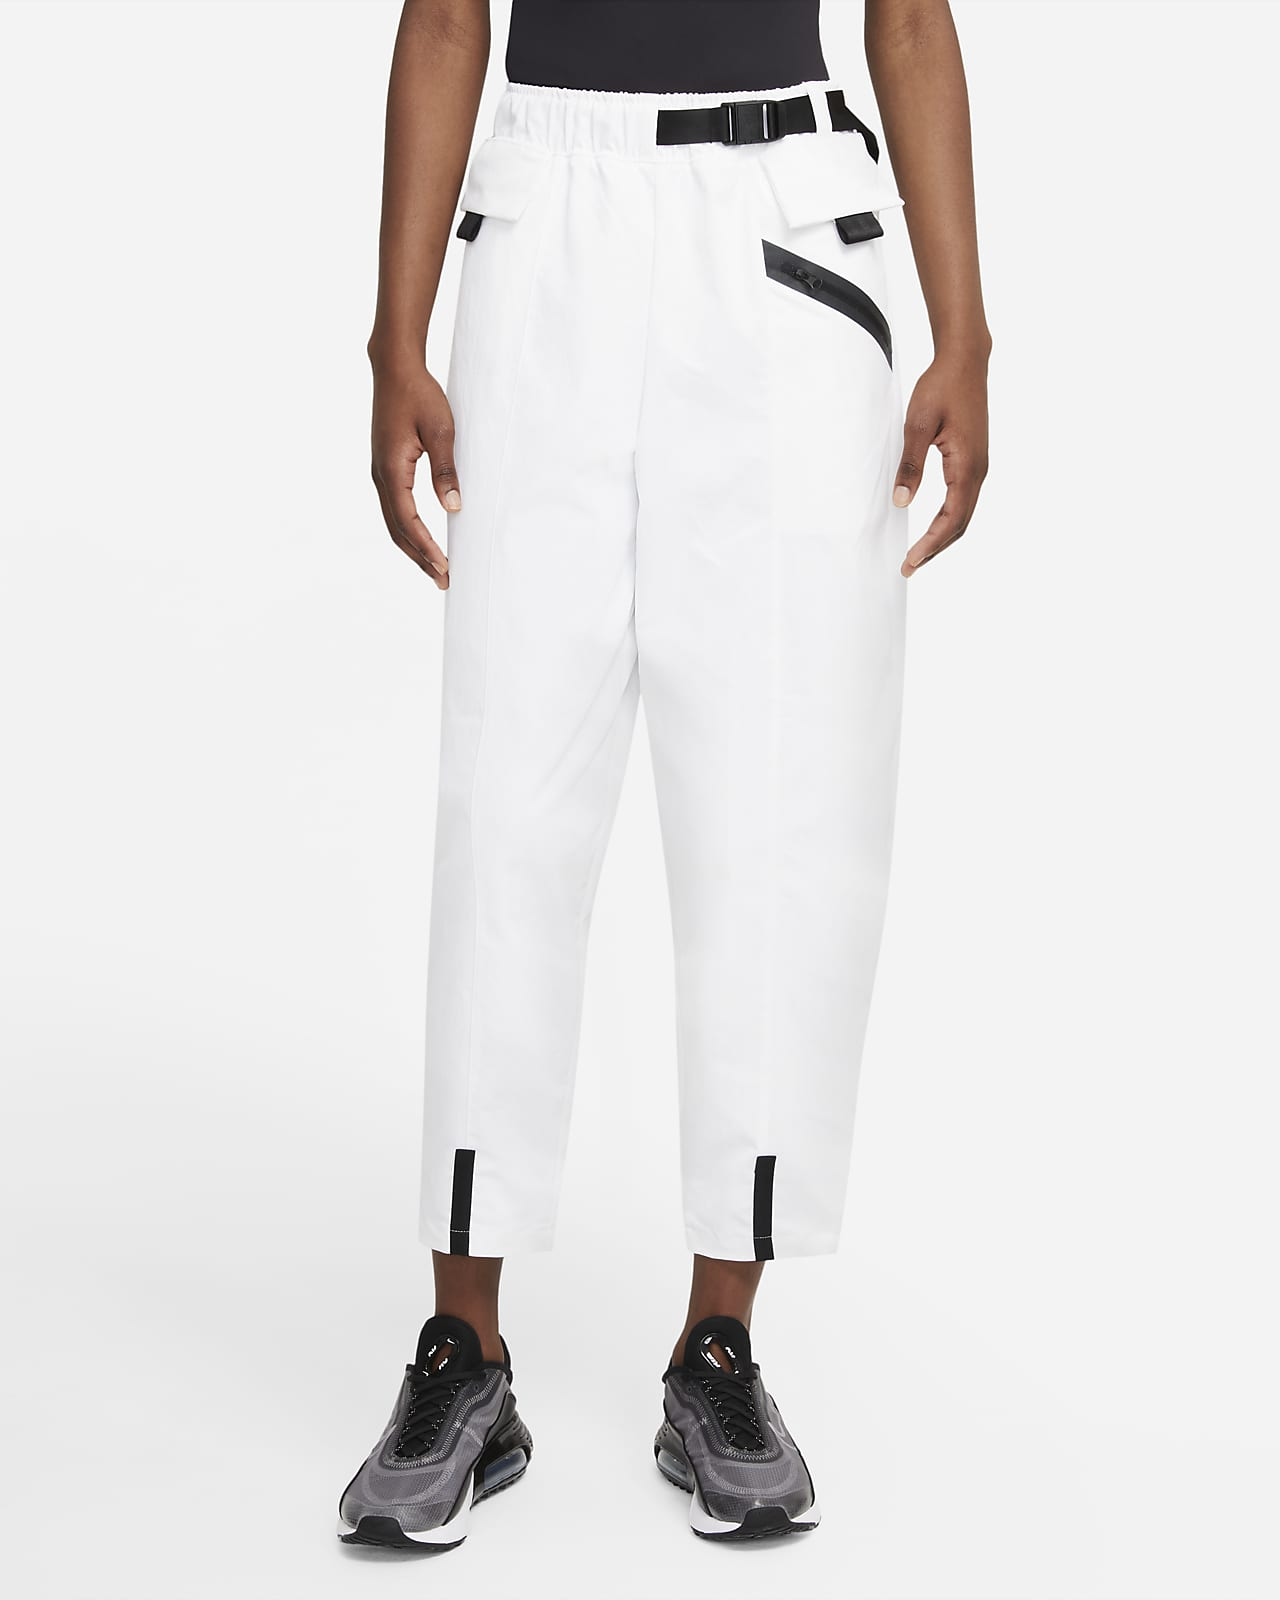 Pantaloni Curve in tessuto Nike Sportswear Tech Pack - Donna